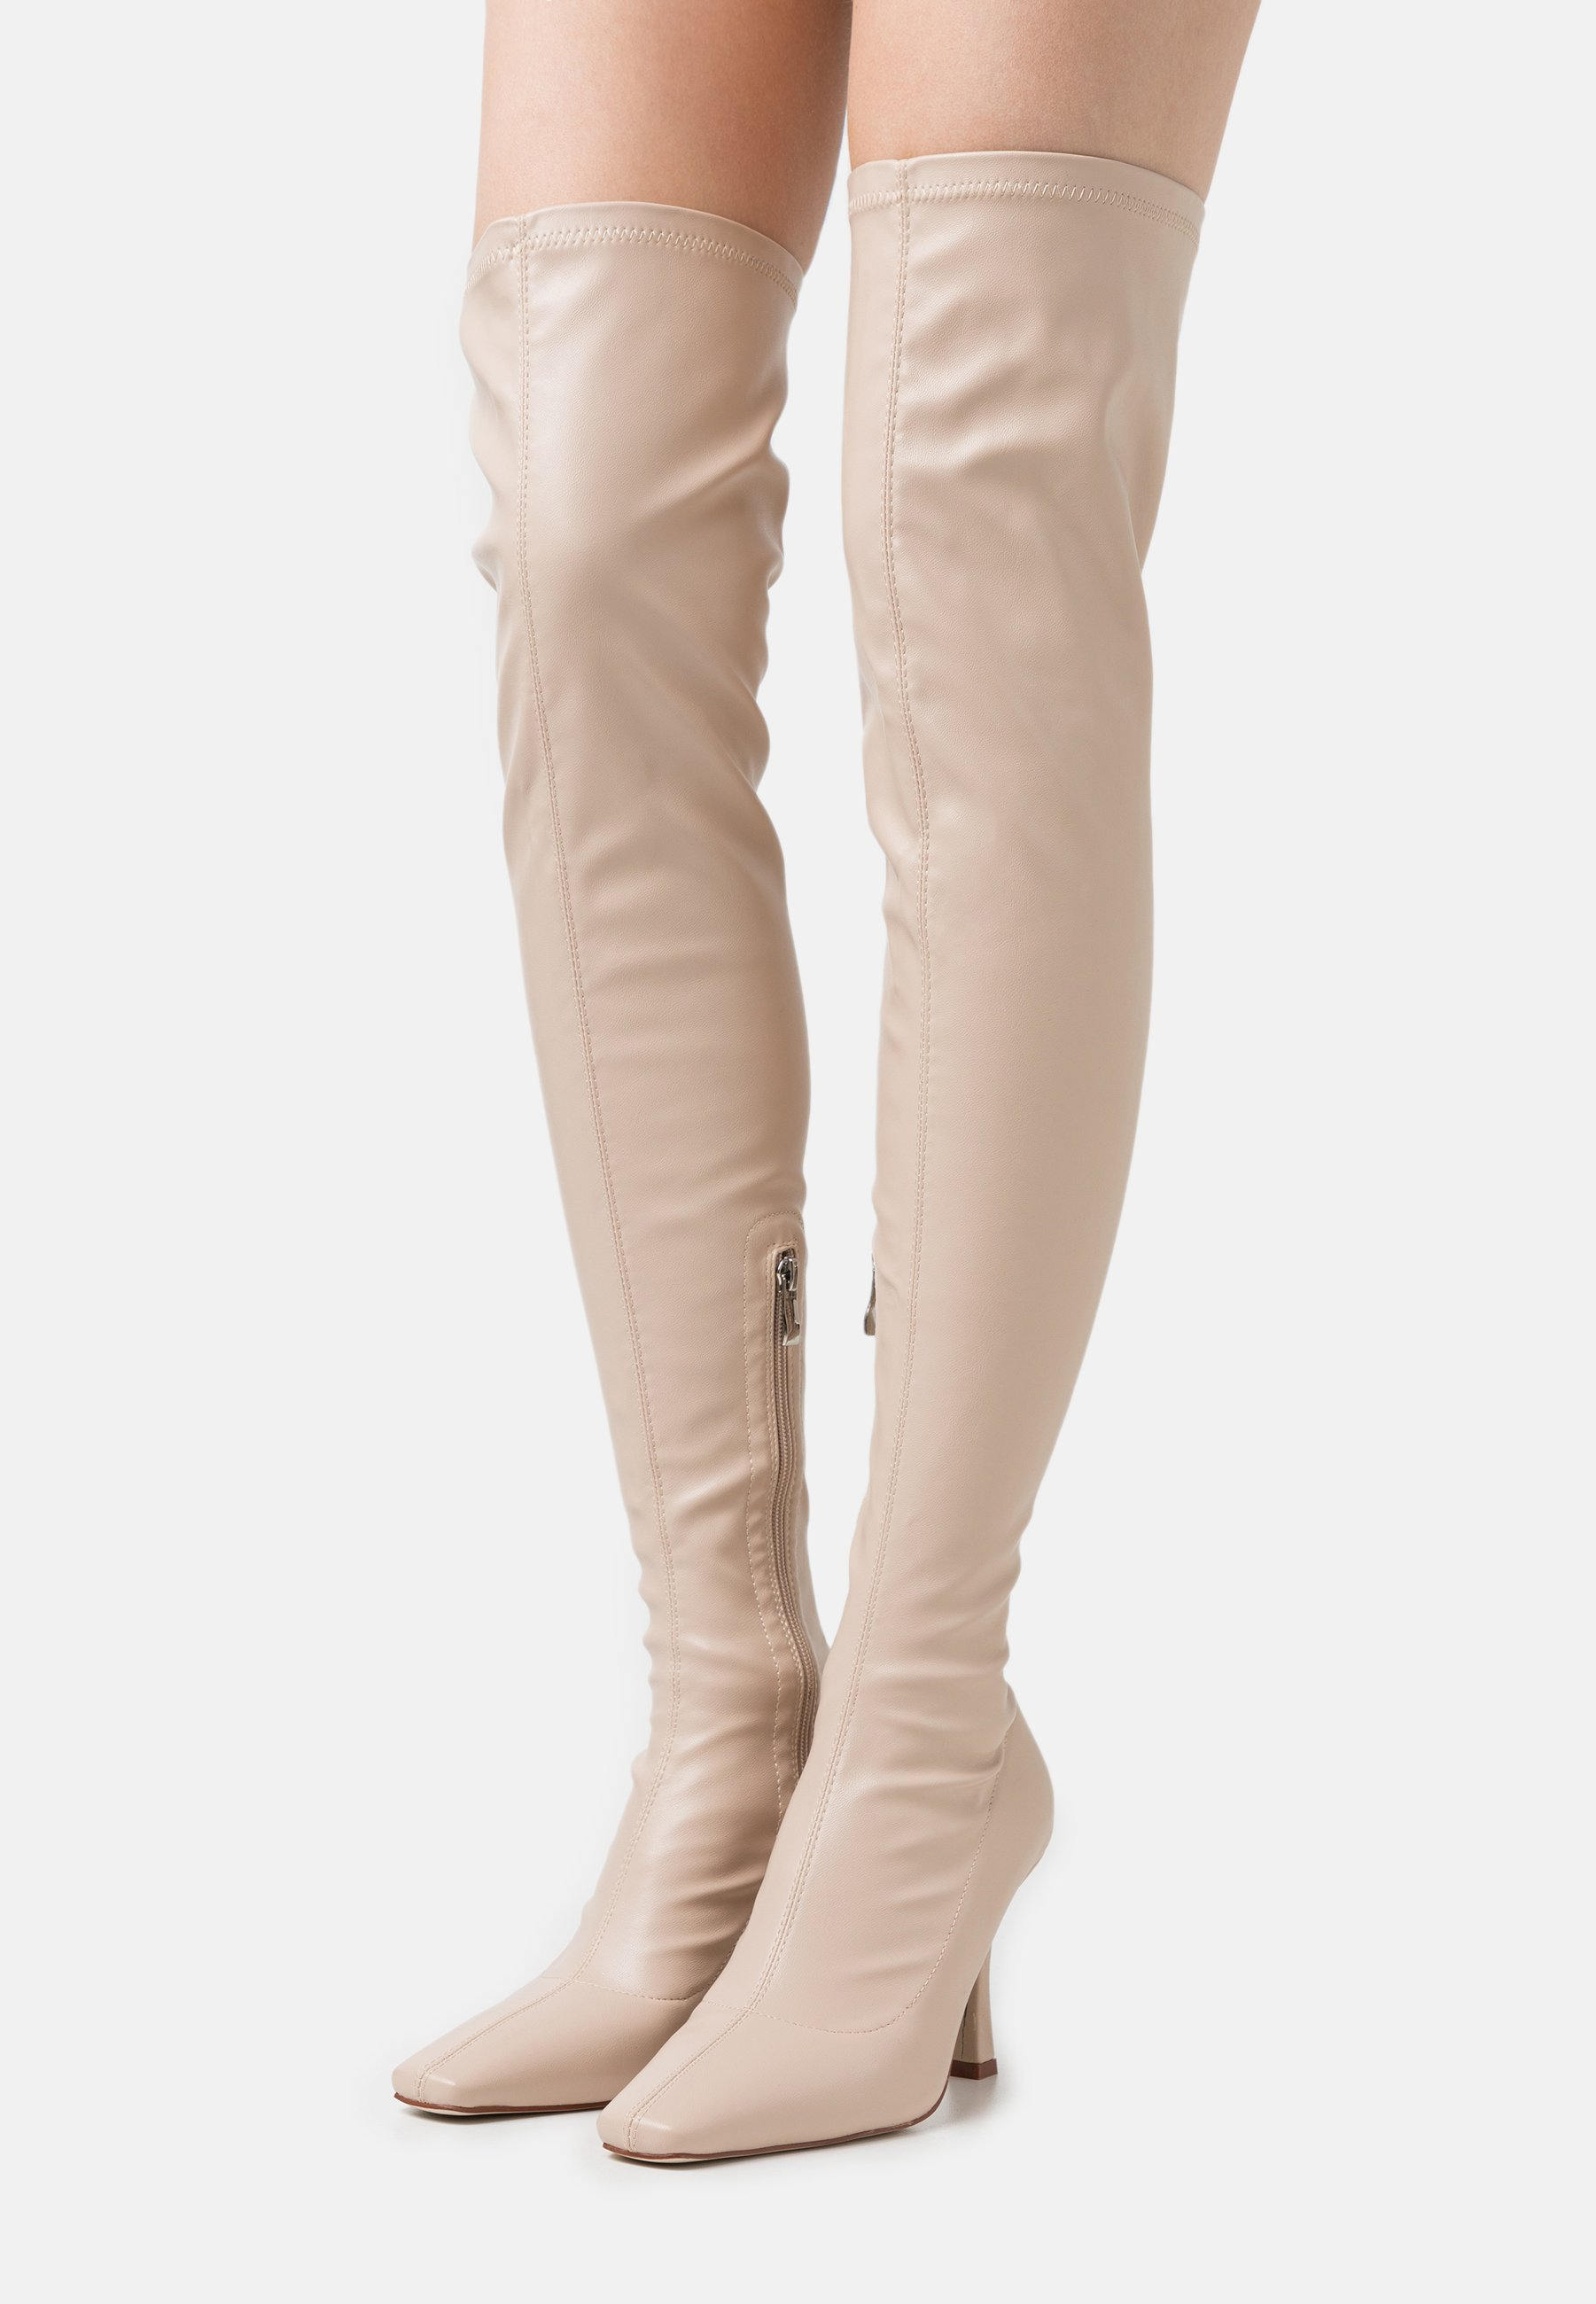 Women OPYUM - Over-the-knee boots - cream